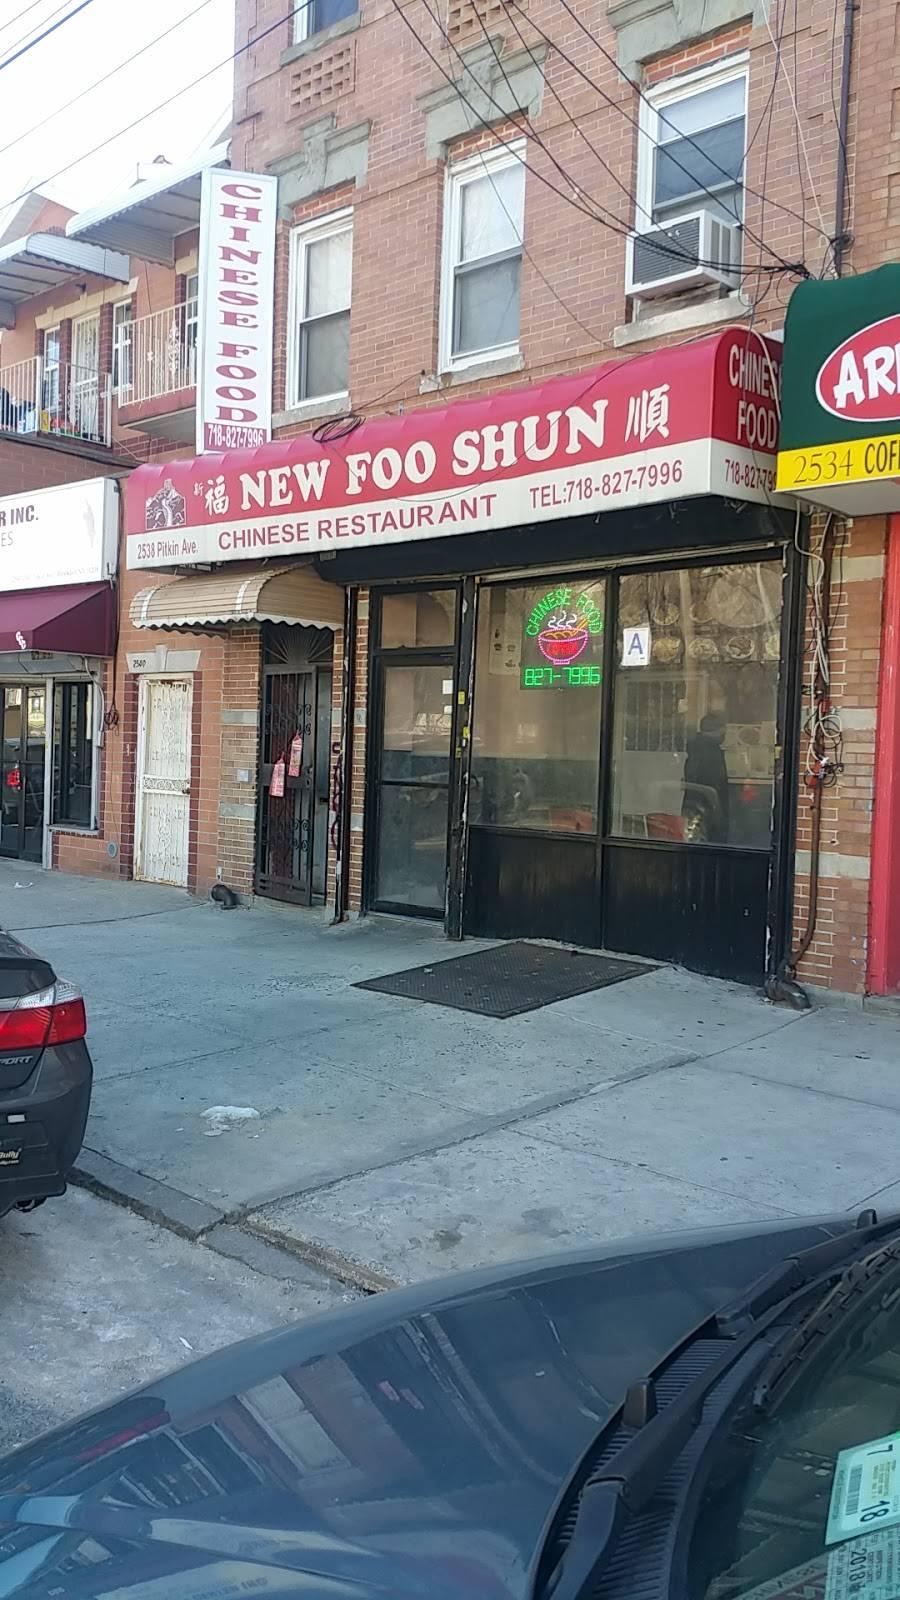 New Foo Shun | restaurant | 2538 Pitkin Ave, Brooklyn, NY 11208, USA | 7188277996 OR +1 718-827-7996